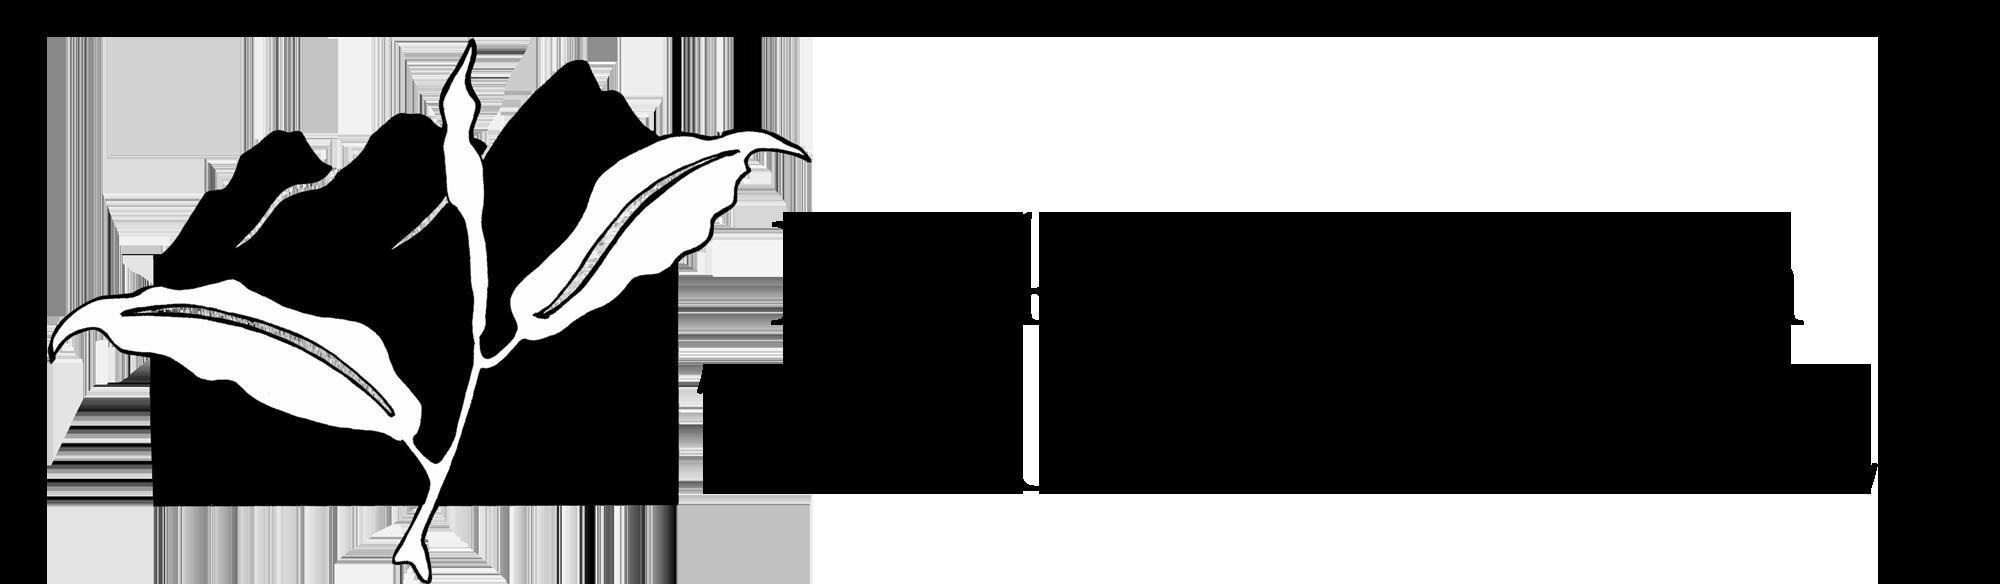 RMTF-Online-Logo-build-2018.png